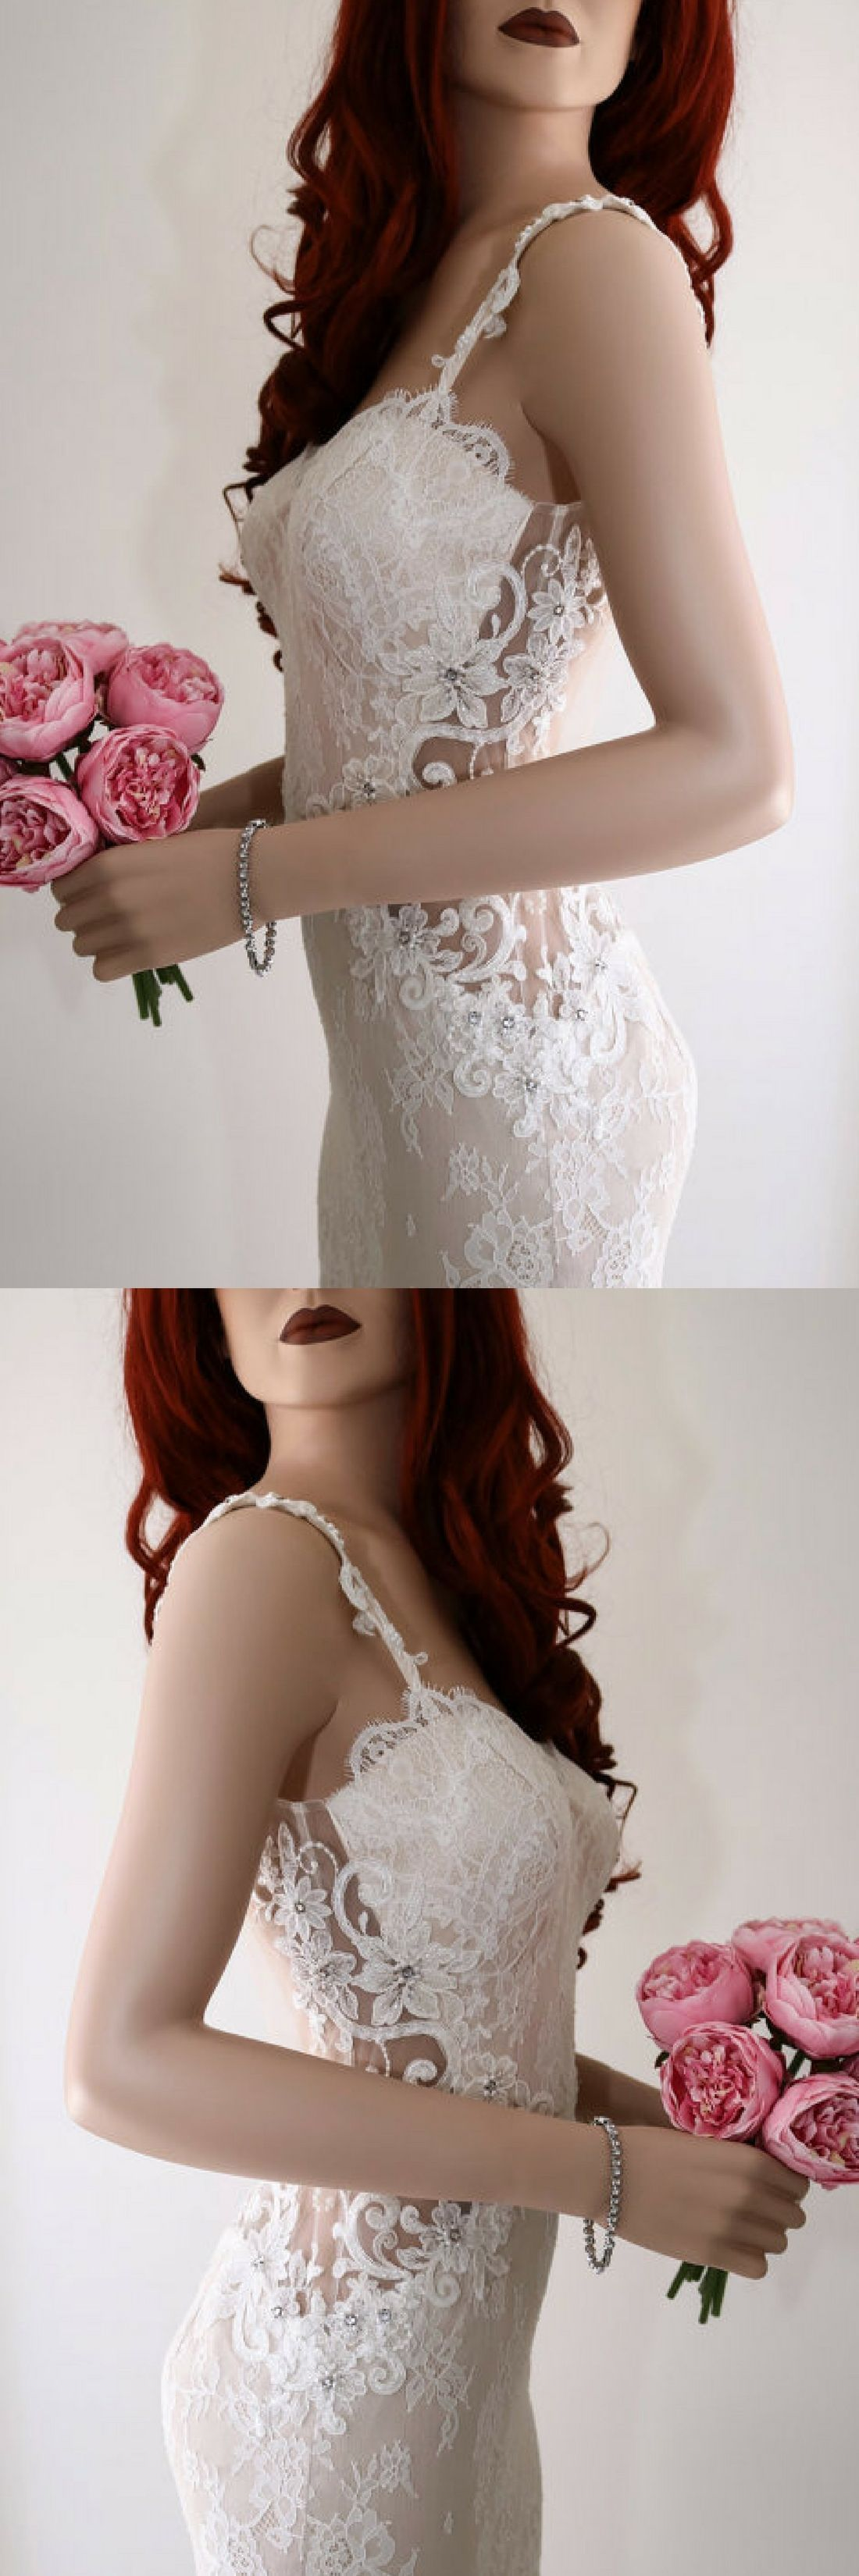 Wedding dress lace wedding dress backless wedding dress boho